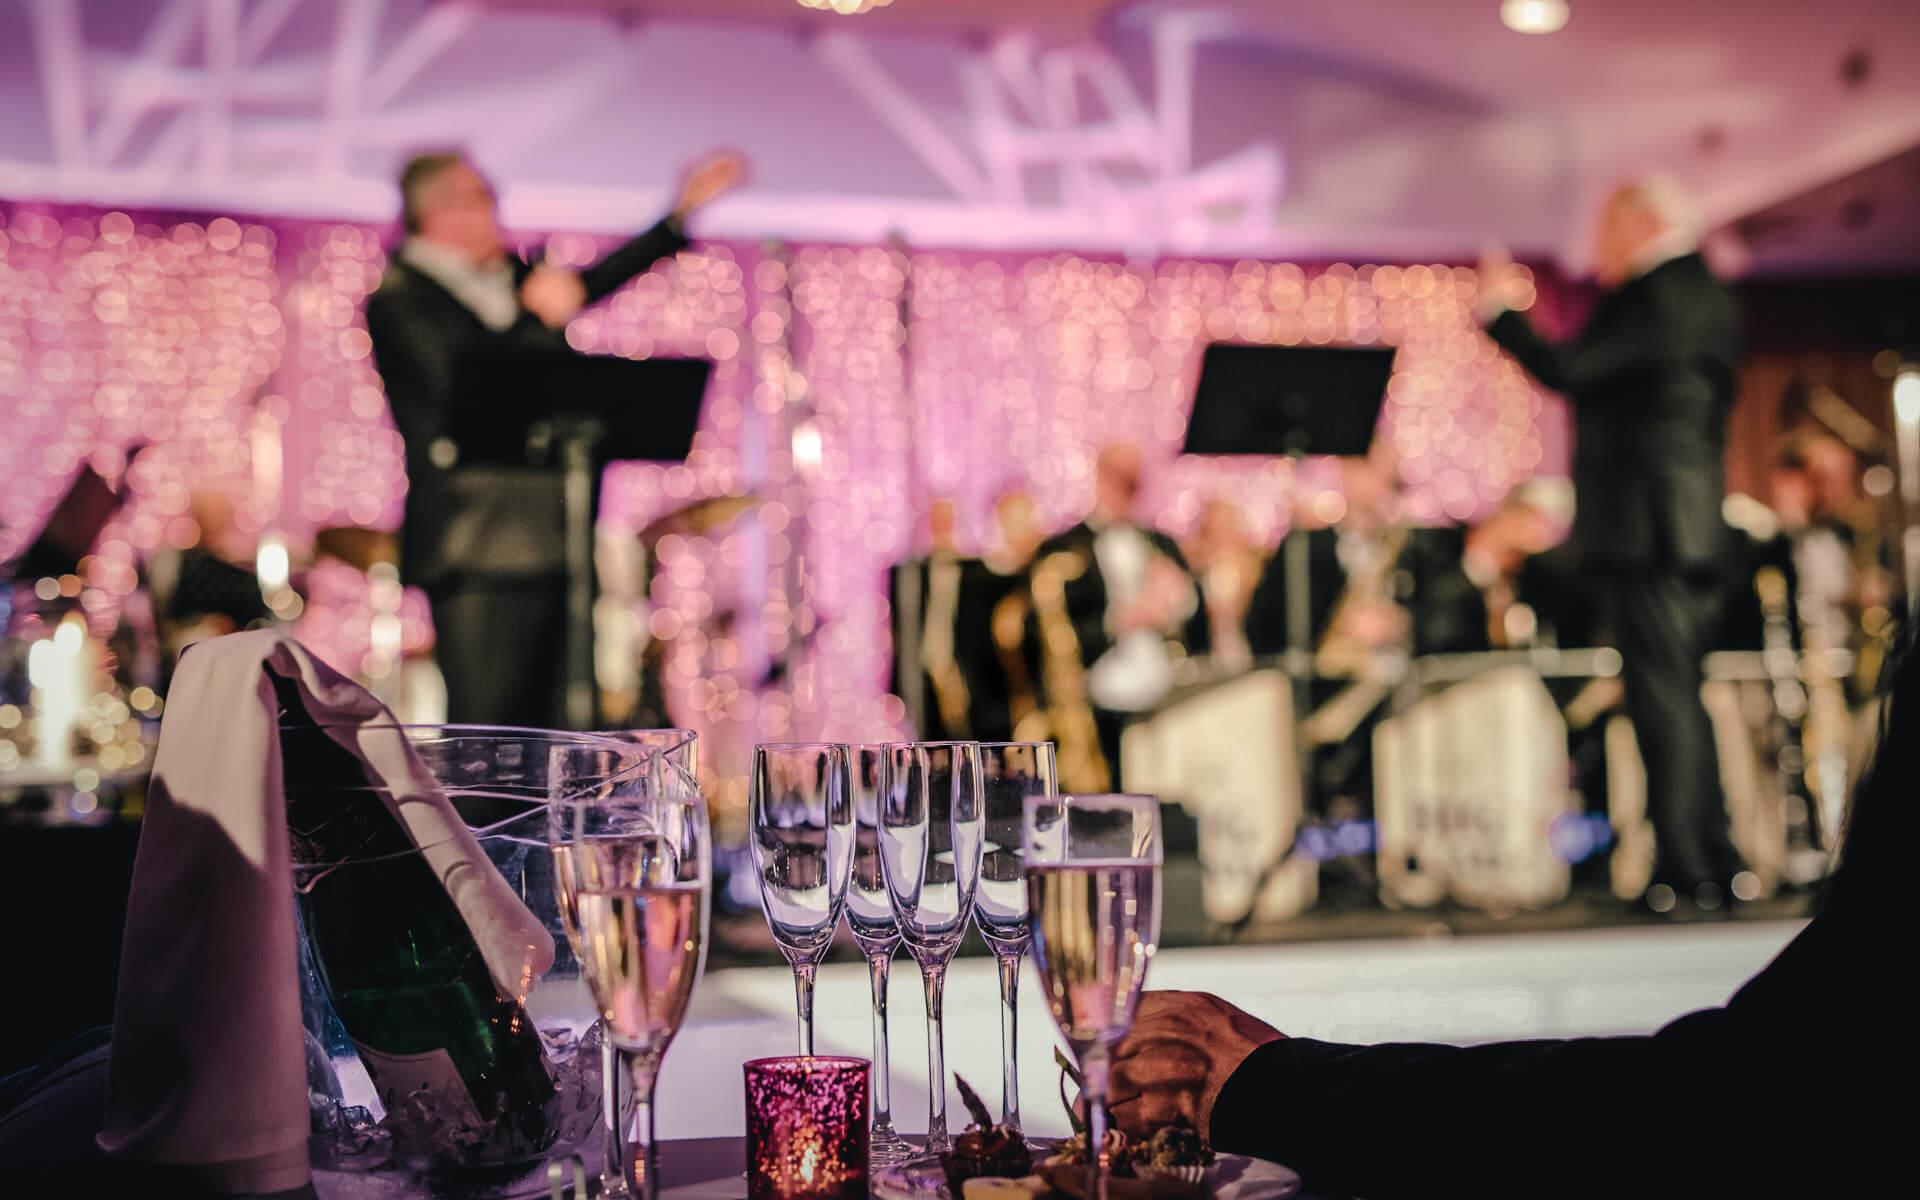 Event, podujatie v resorte Kaskady - koncert